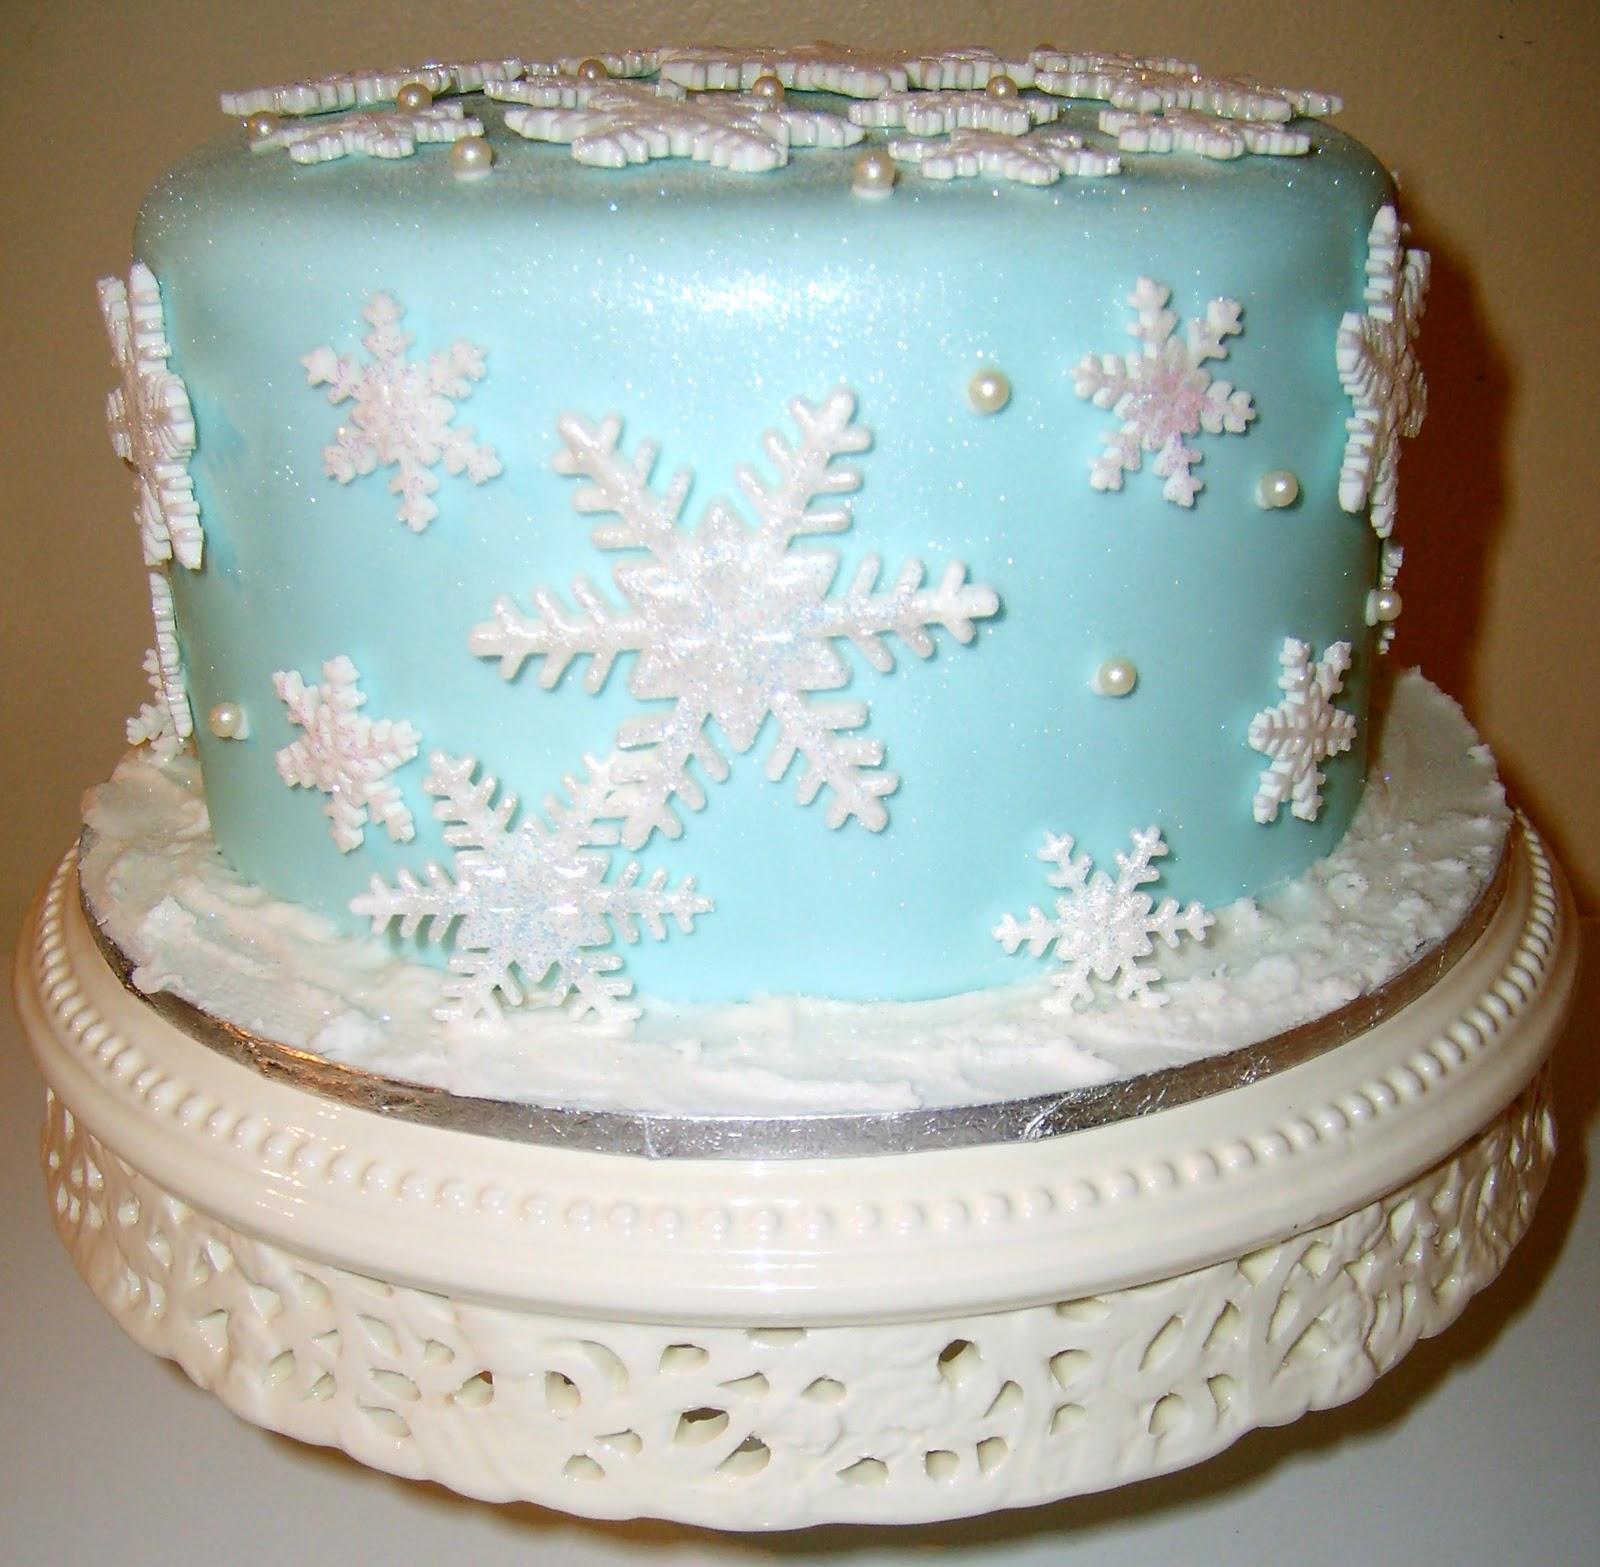 Surprising 8 Snowflake Birthday Cakes Buttercream Photo Birthday Cake Personalised Birthday Cards Beptaeletsinfo